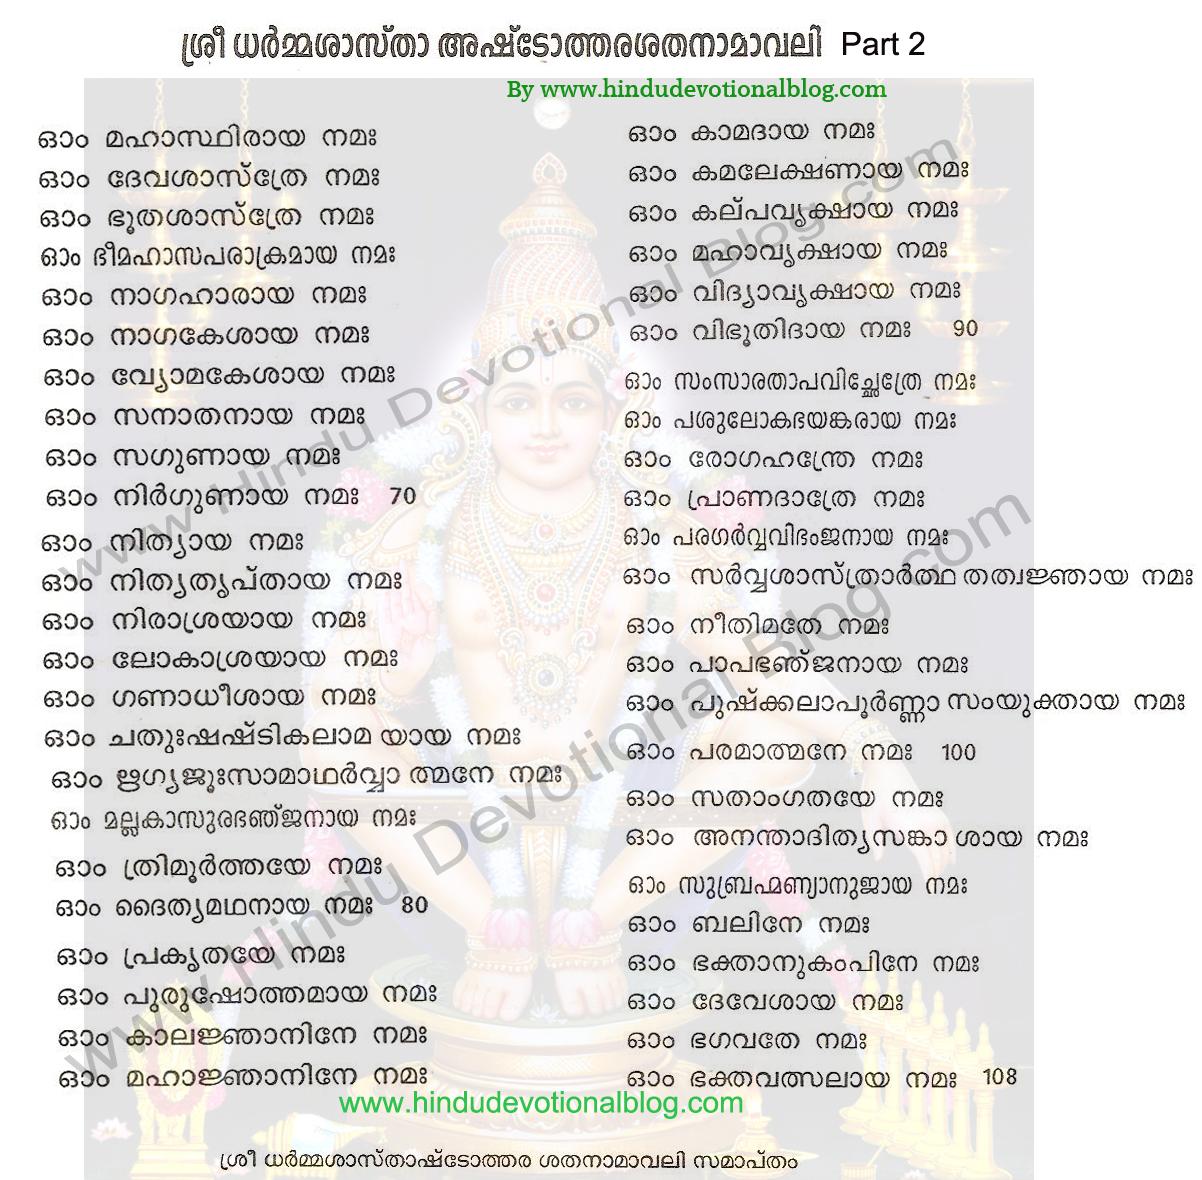 108 ayyappa saranam in english